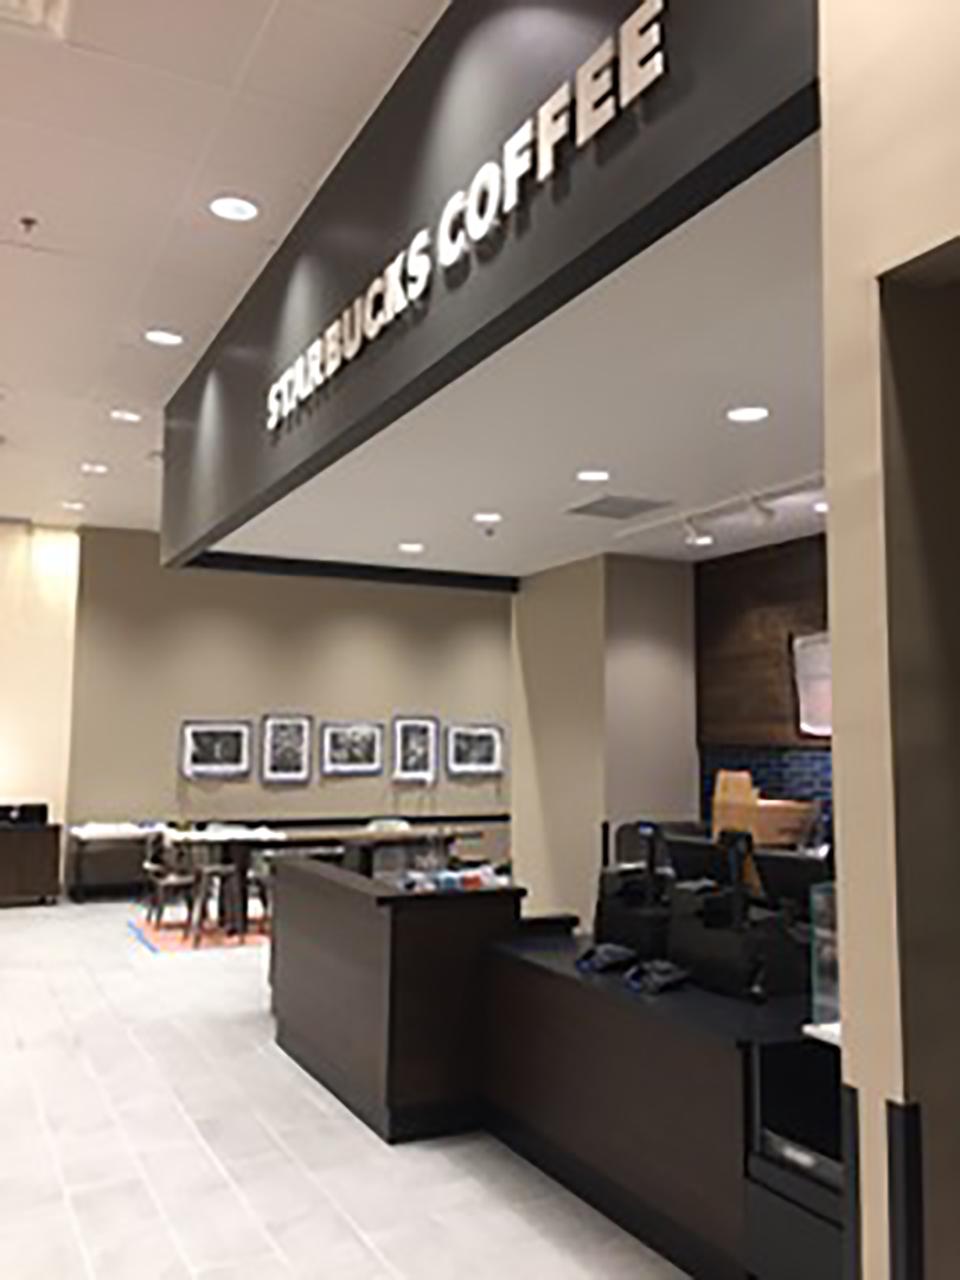 Starbucks Seating Area